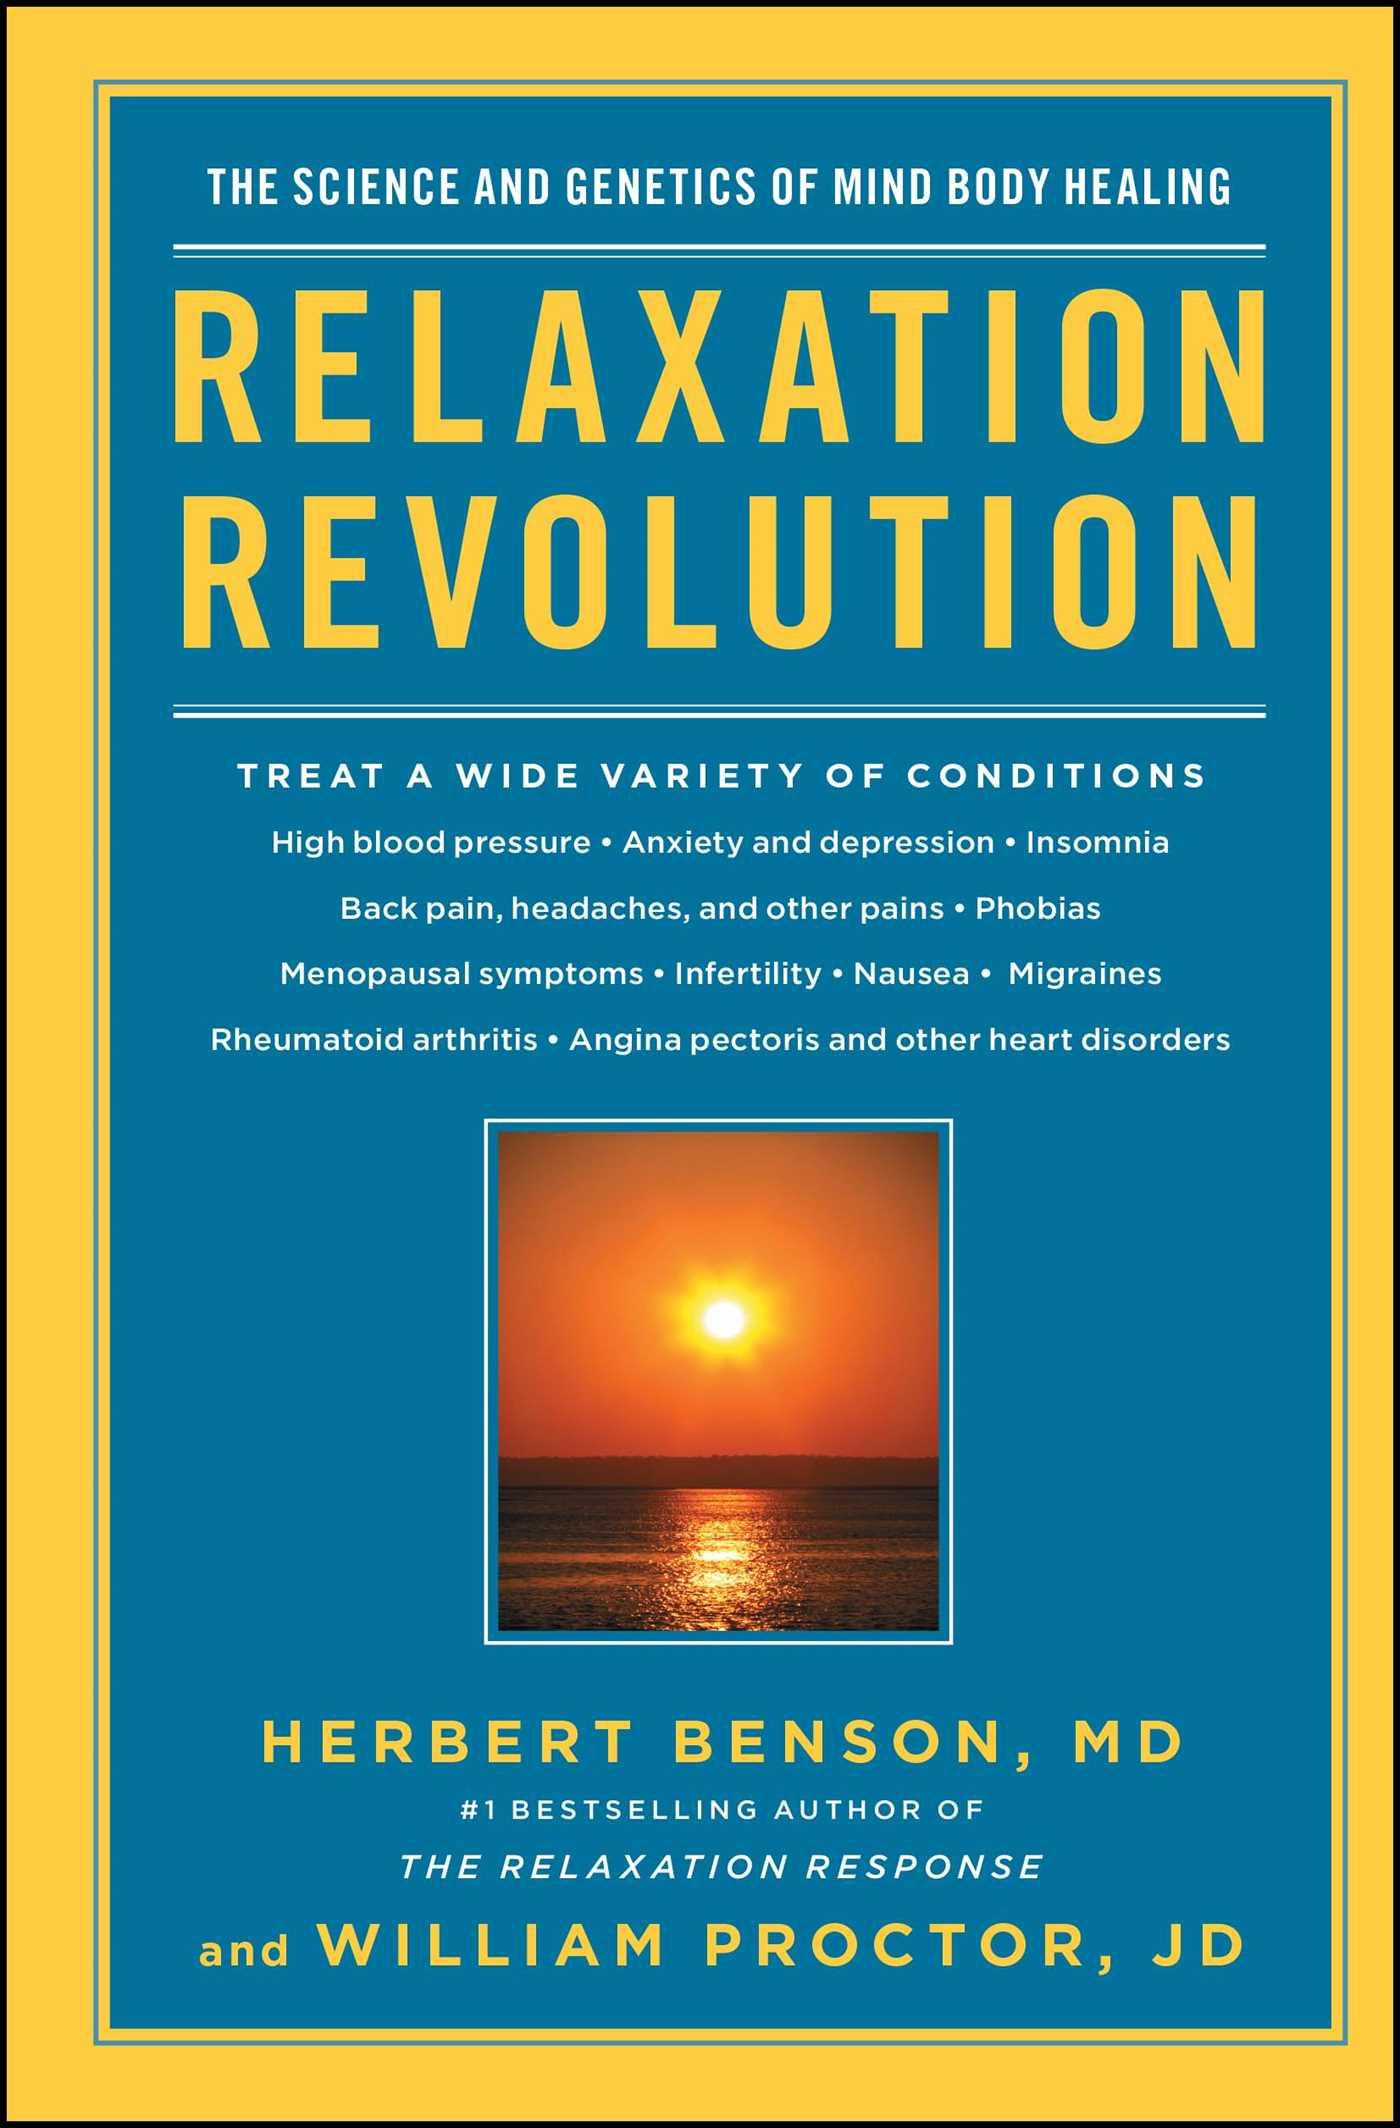 Relaxation revolution 9781439148662 hr